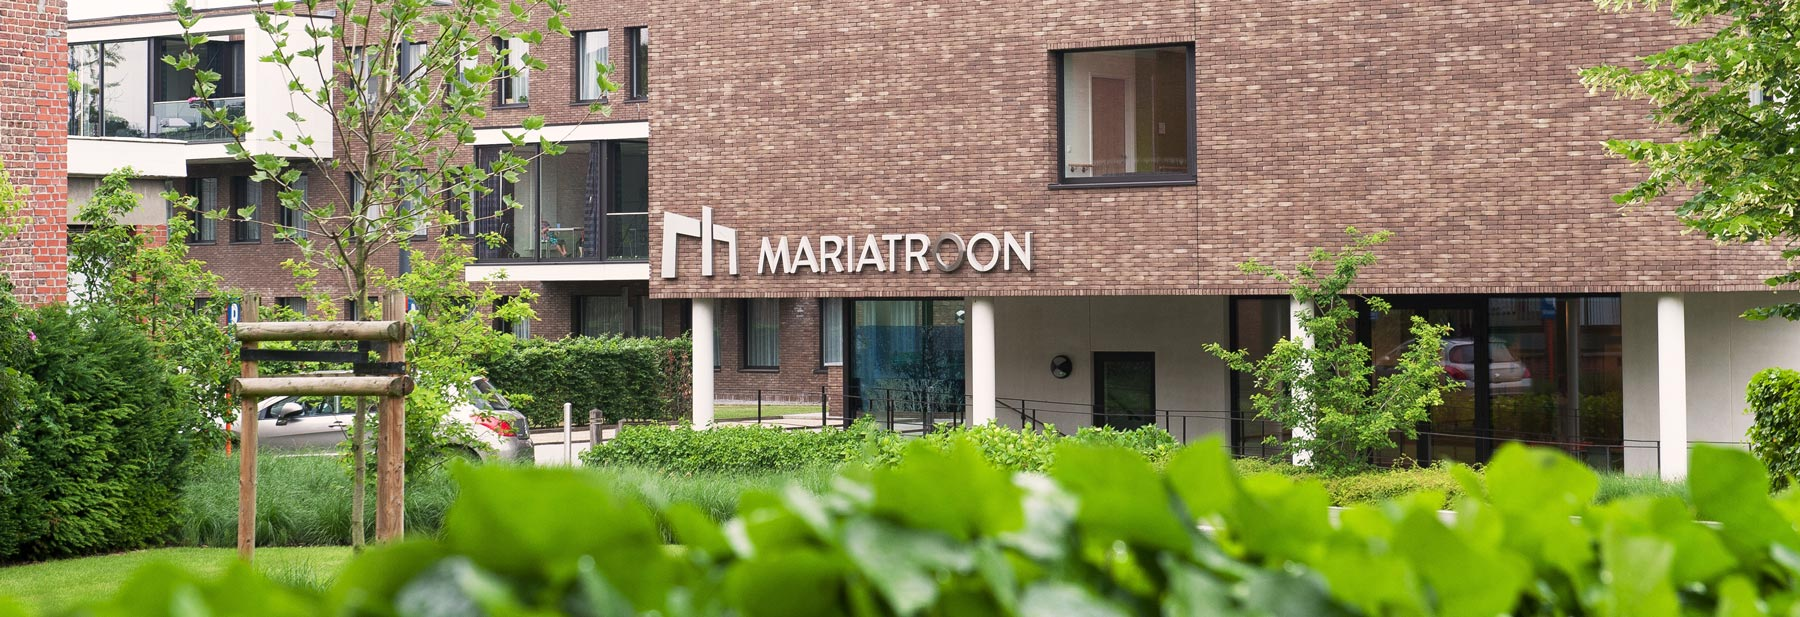 Woonzorgcentrum Mariatroon Dendermonde gevel